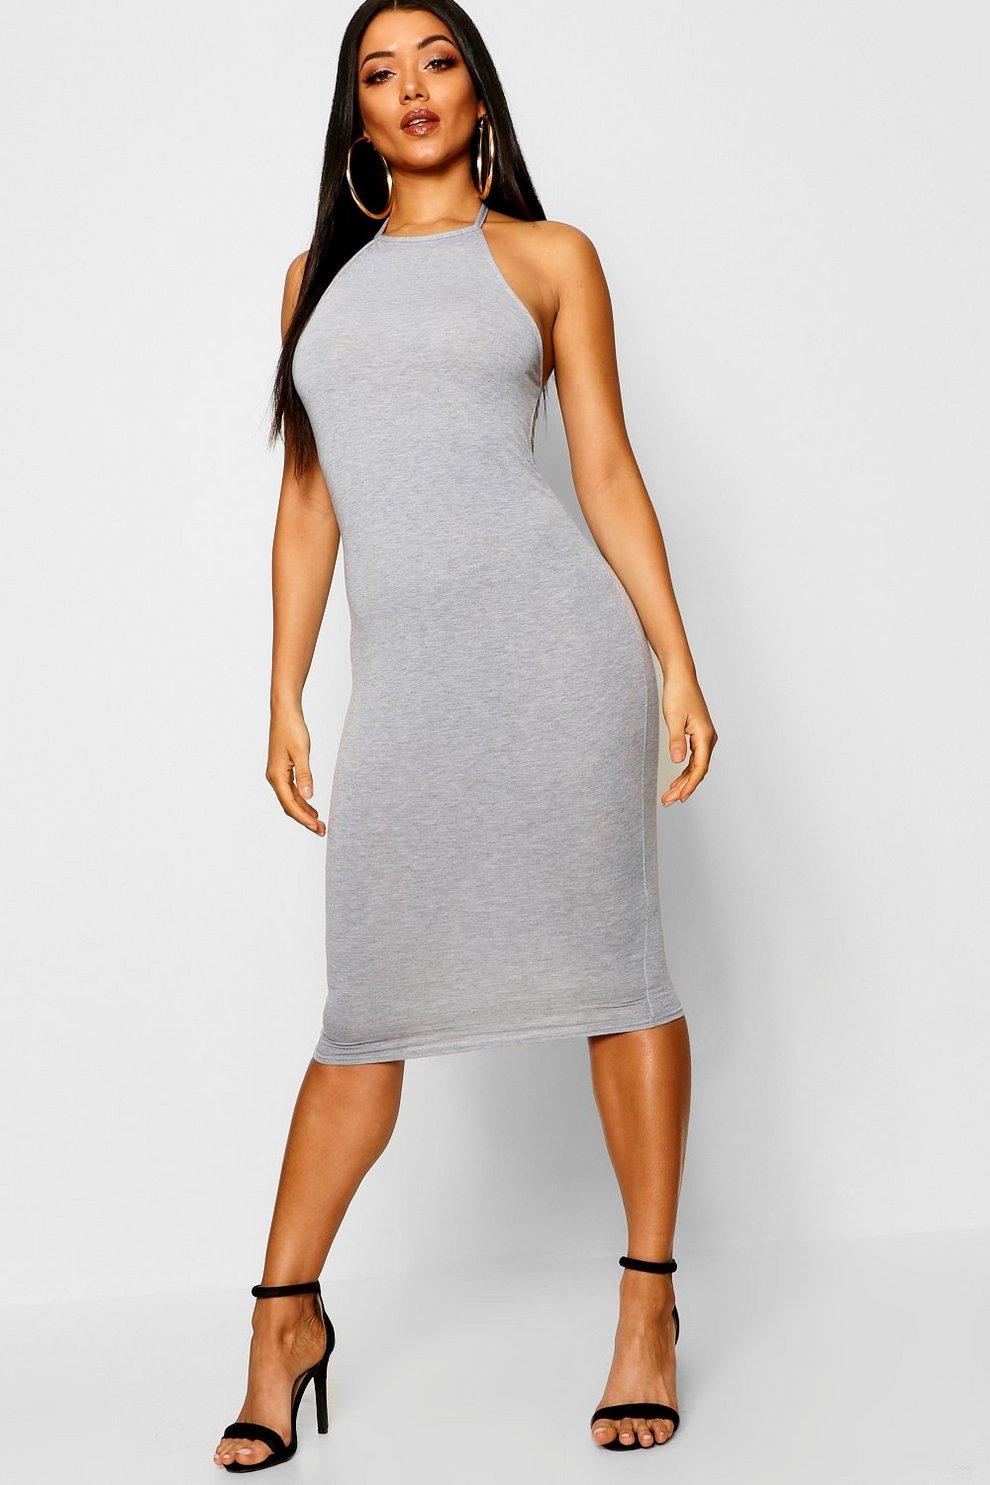 bddac7d90fc Womens Grey marl Basic 90s Neck Midi Dress